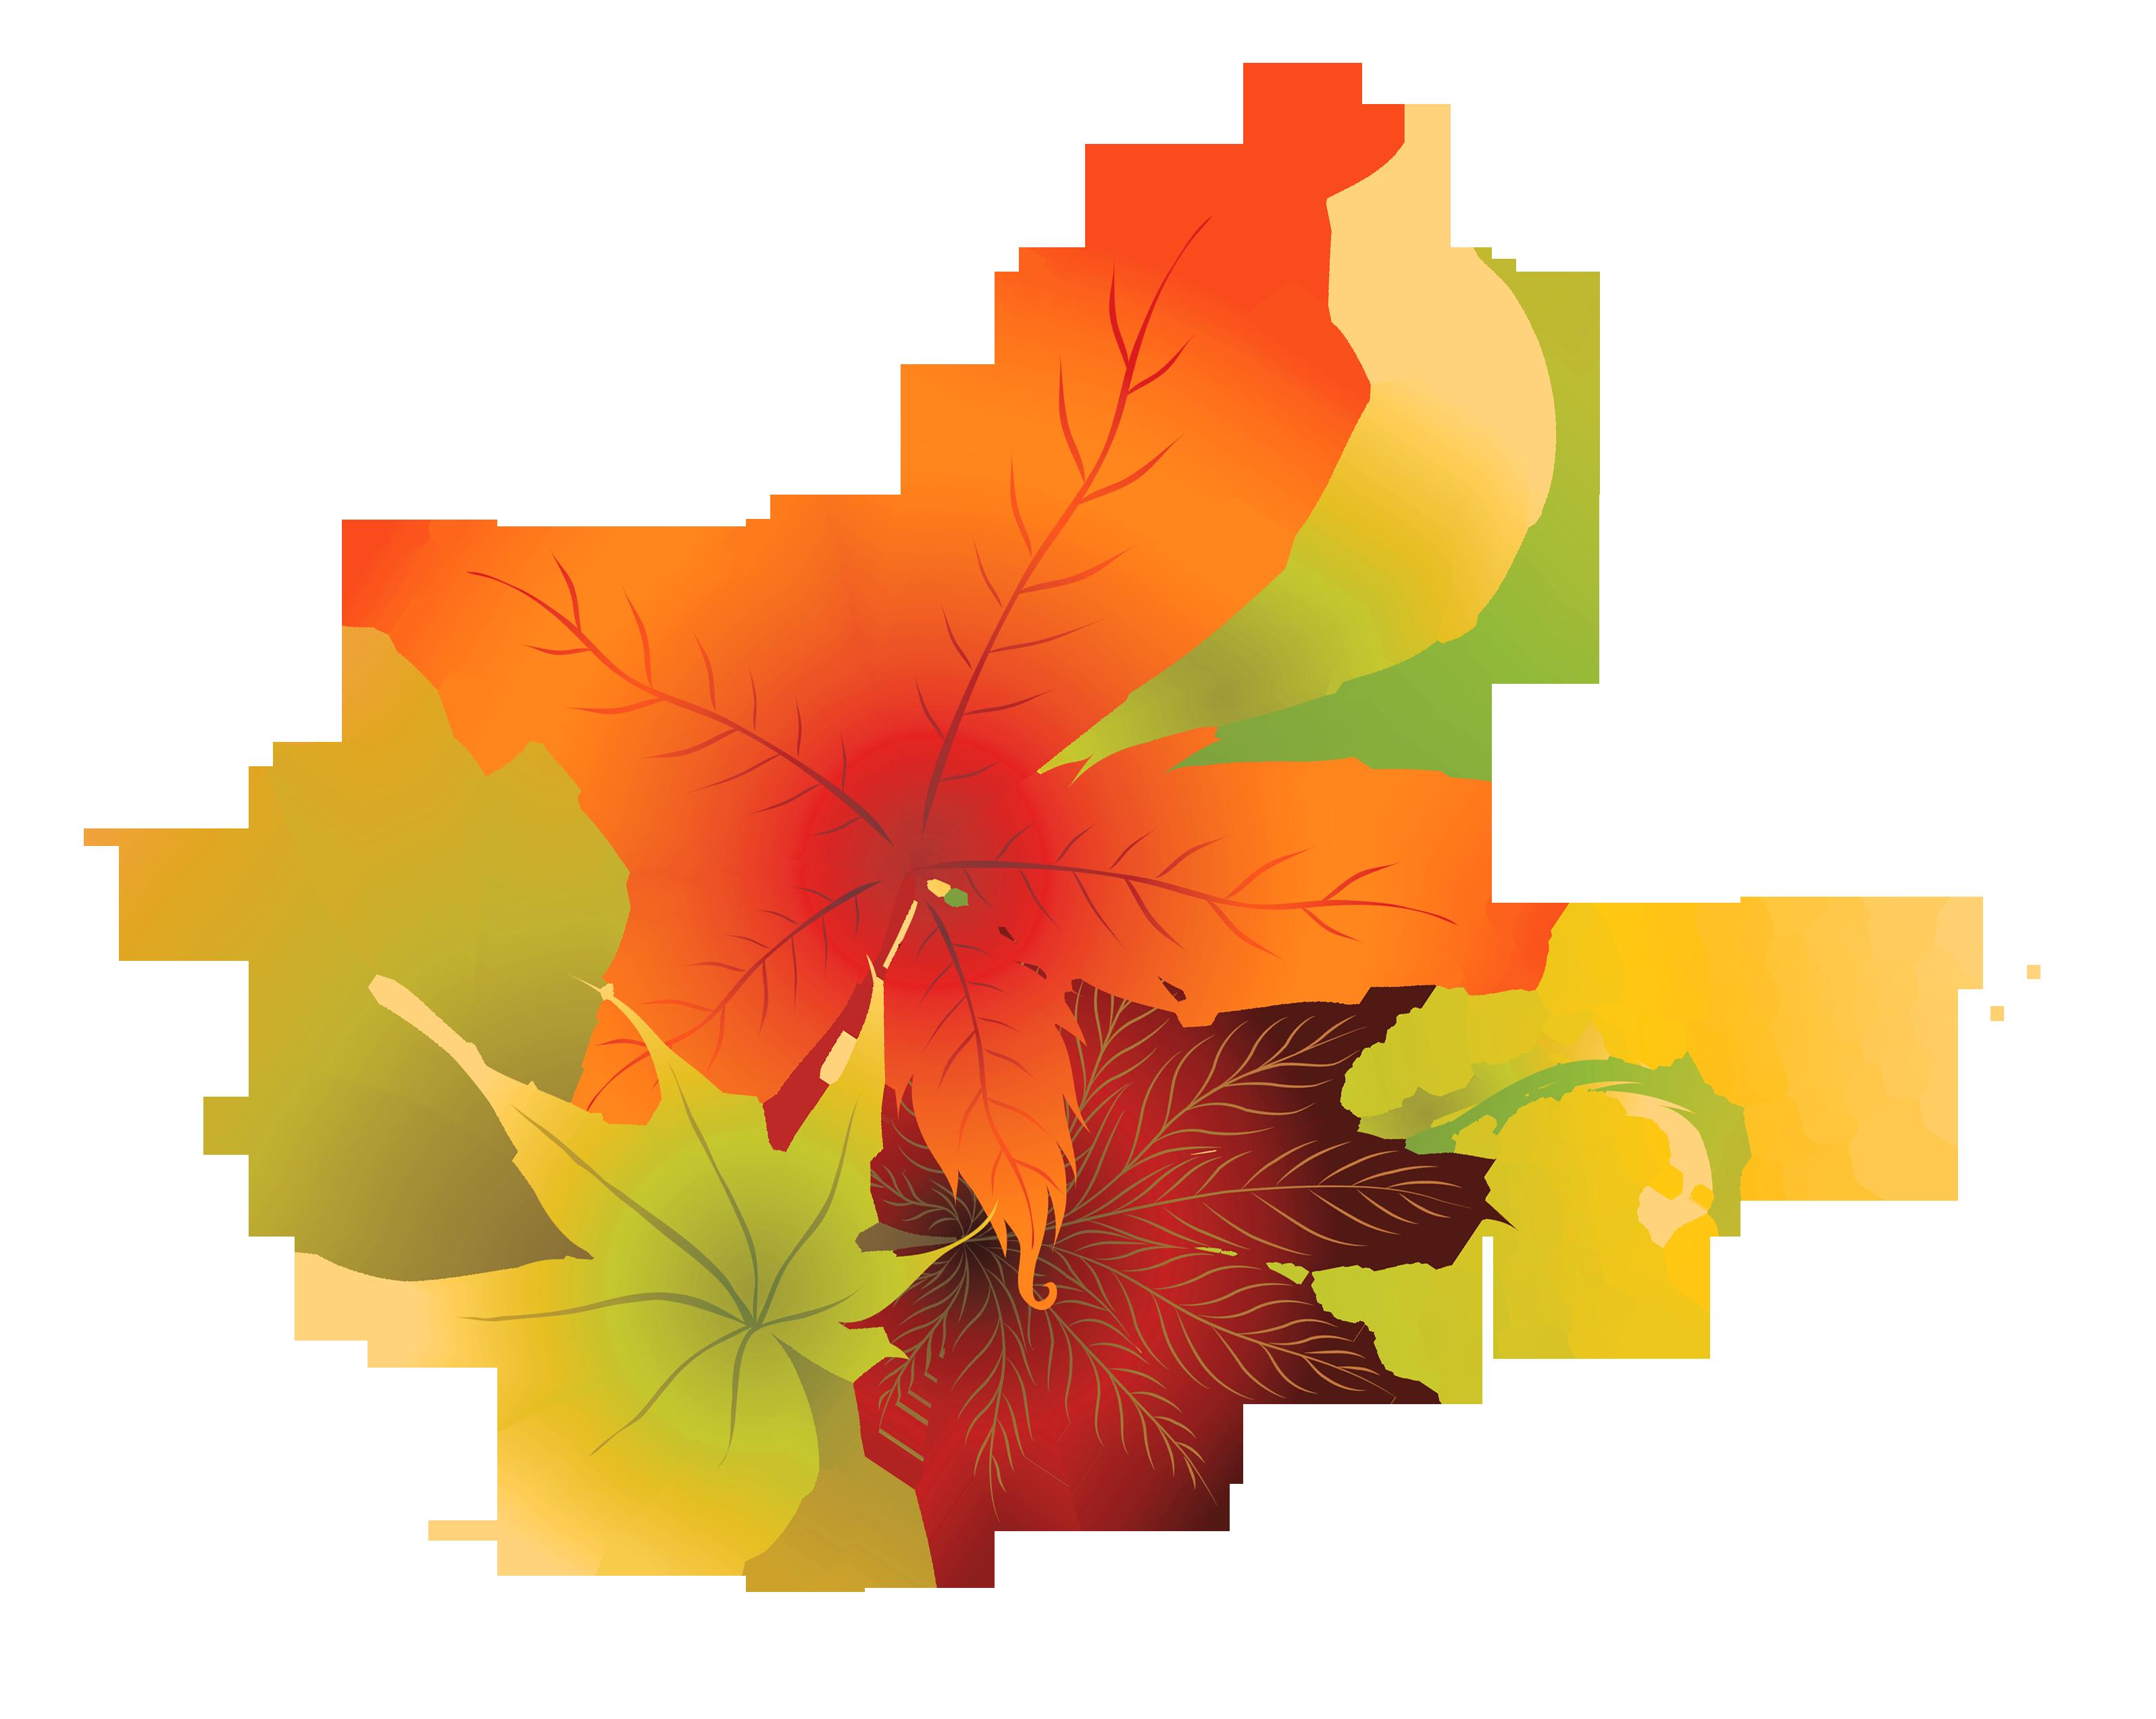 Fall Leaves 7 Free Autumn And Fall Clip -Fall leaves 7 free autumn and fall clip art collections 2 clipartcow-11